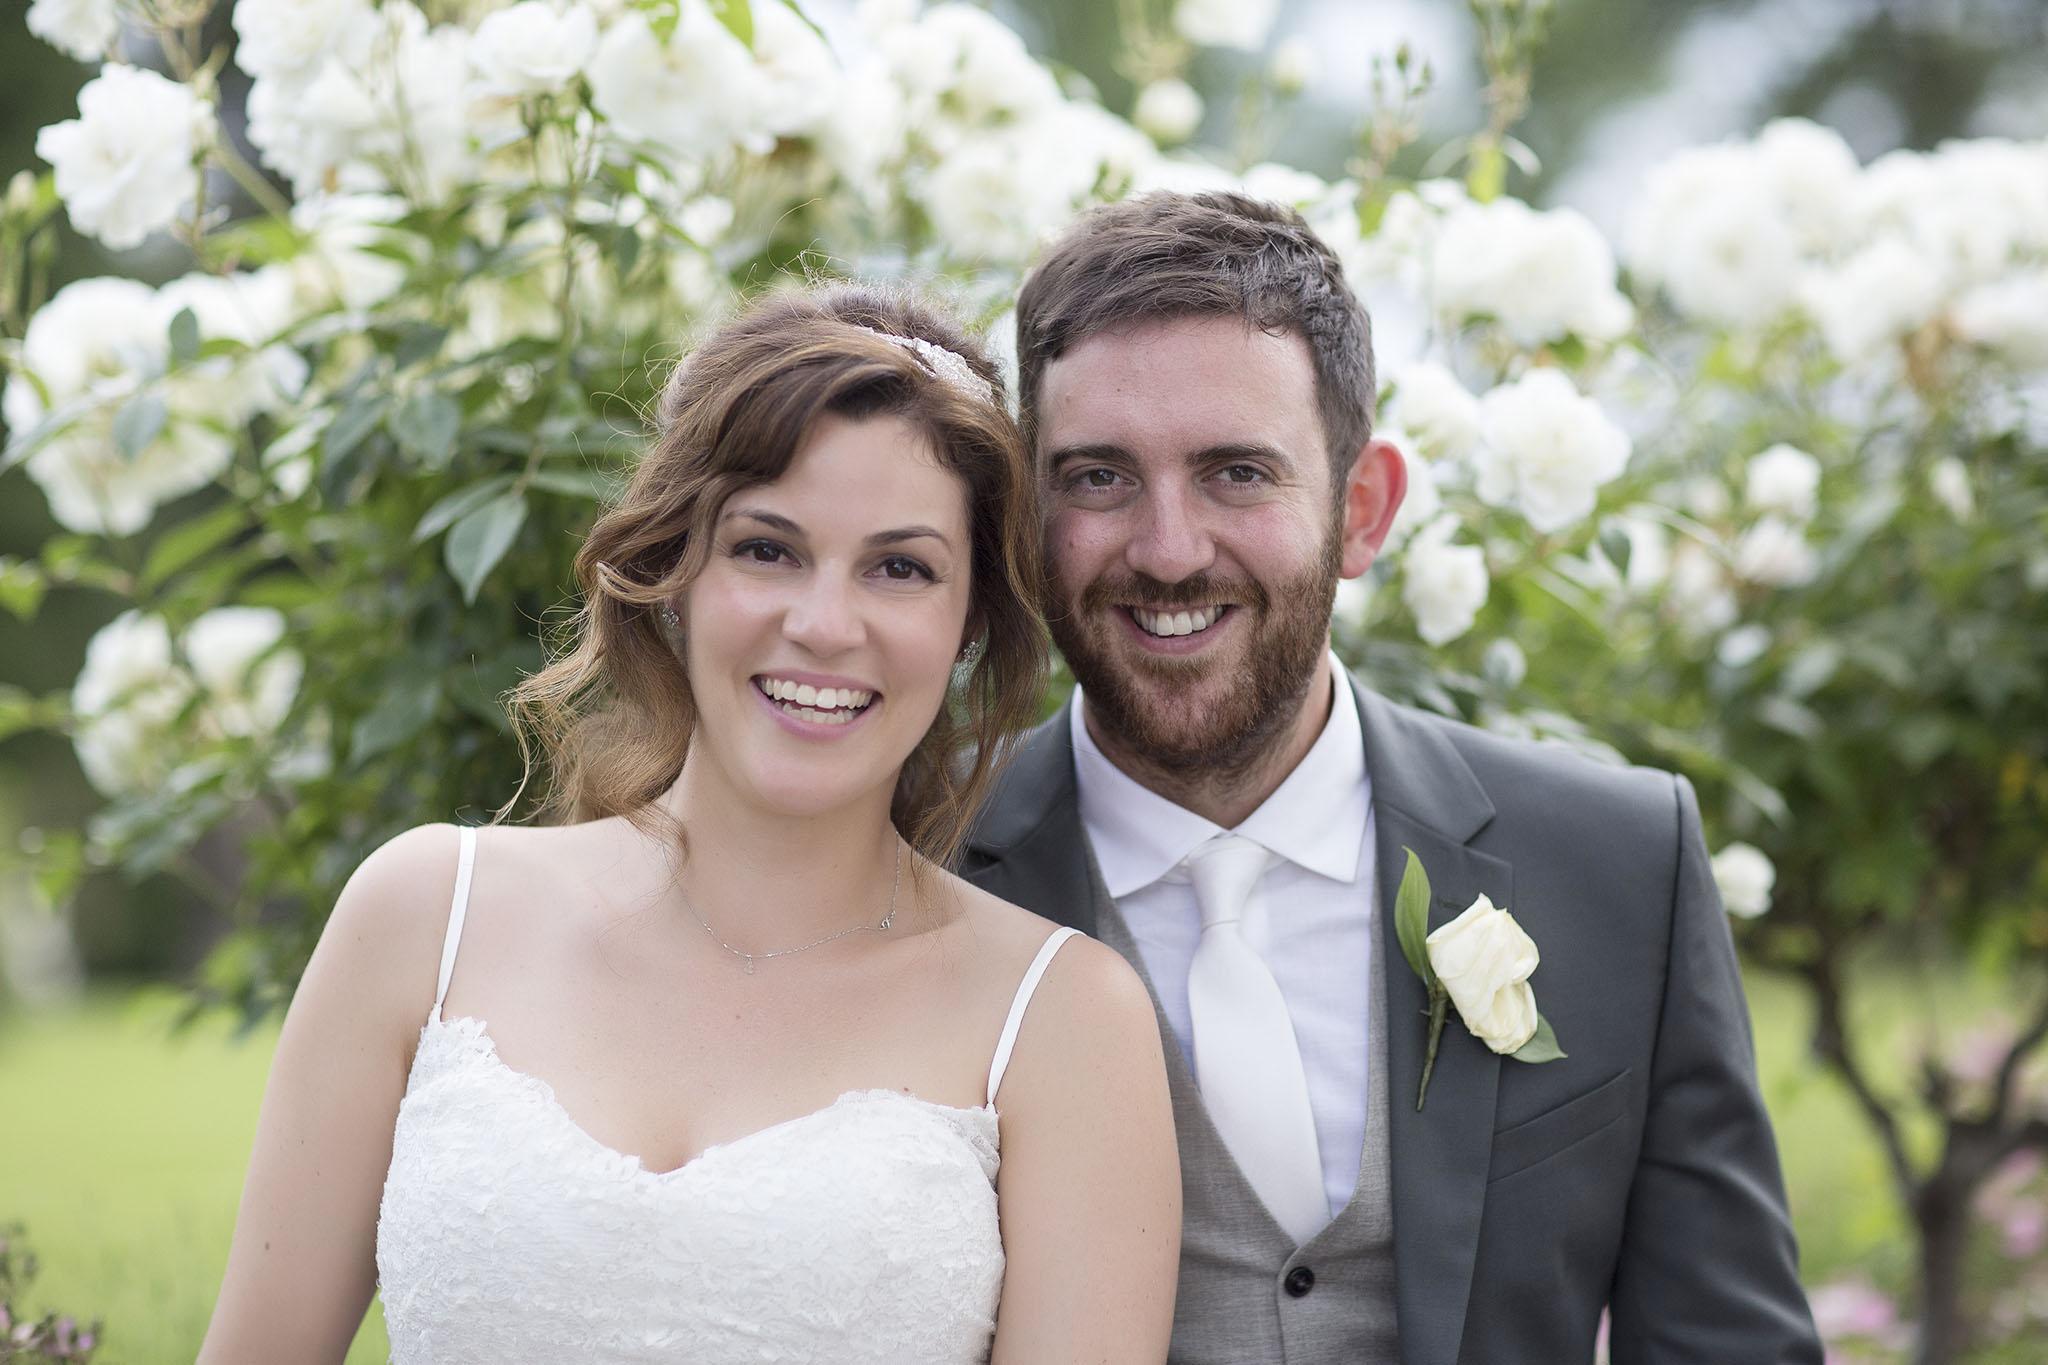 elizabethgphotography_kingslangley_hertfordshire_fineart_wedding_enfield_ricky_nicole_nahlis_52.jpg